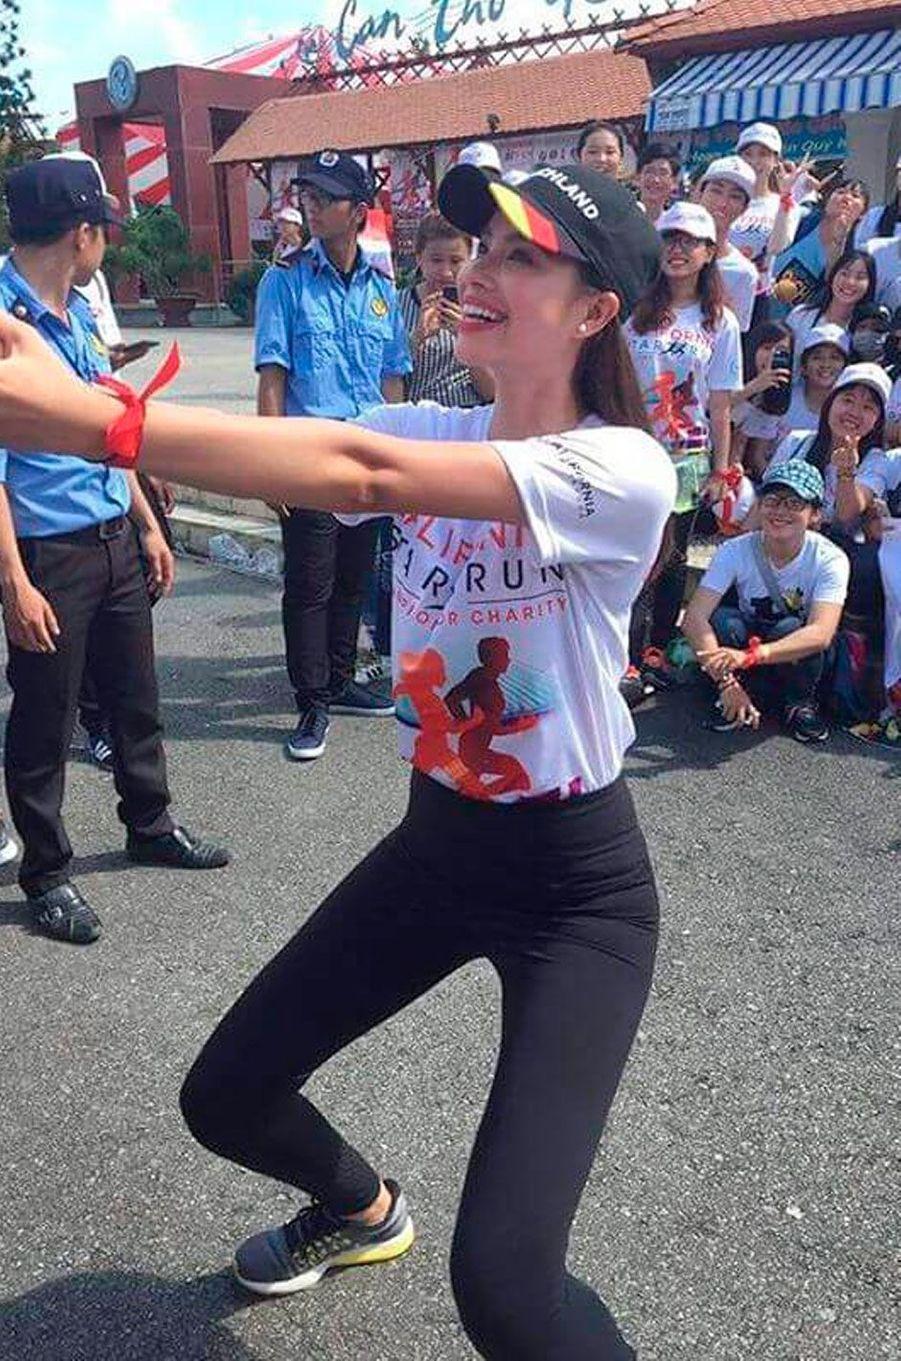 Miss Vietnam, Dang Thi Le Hang